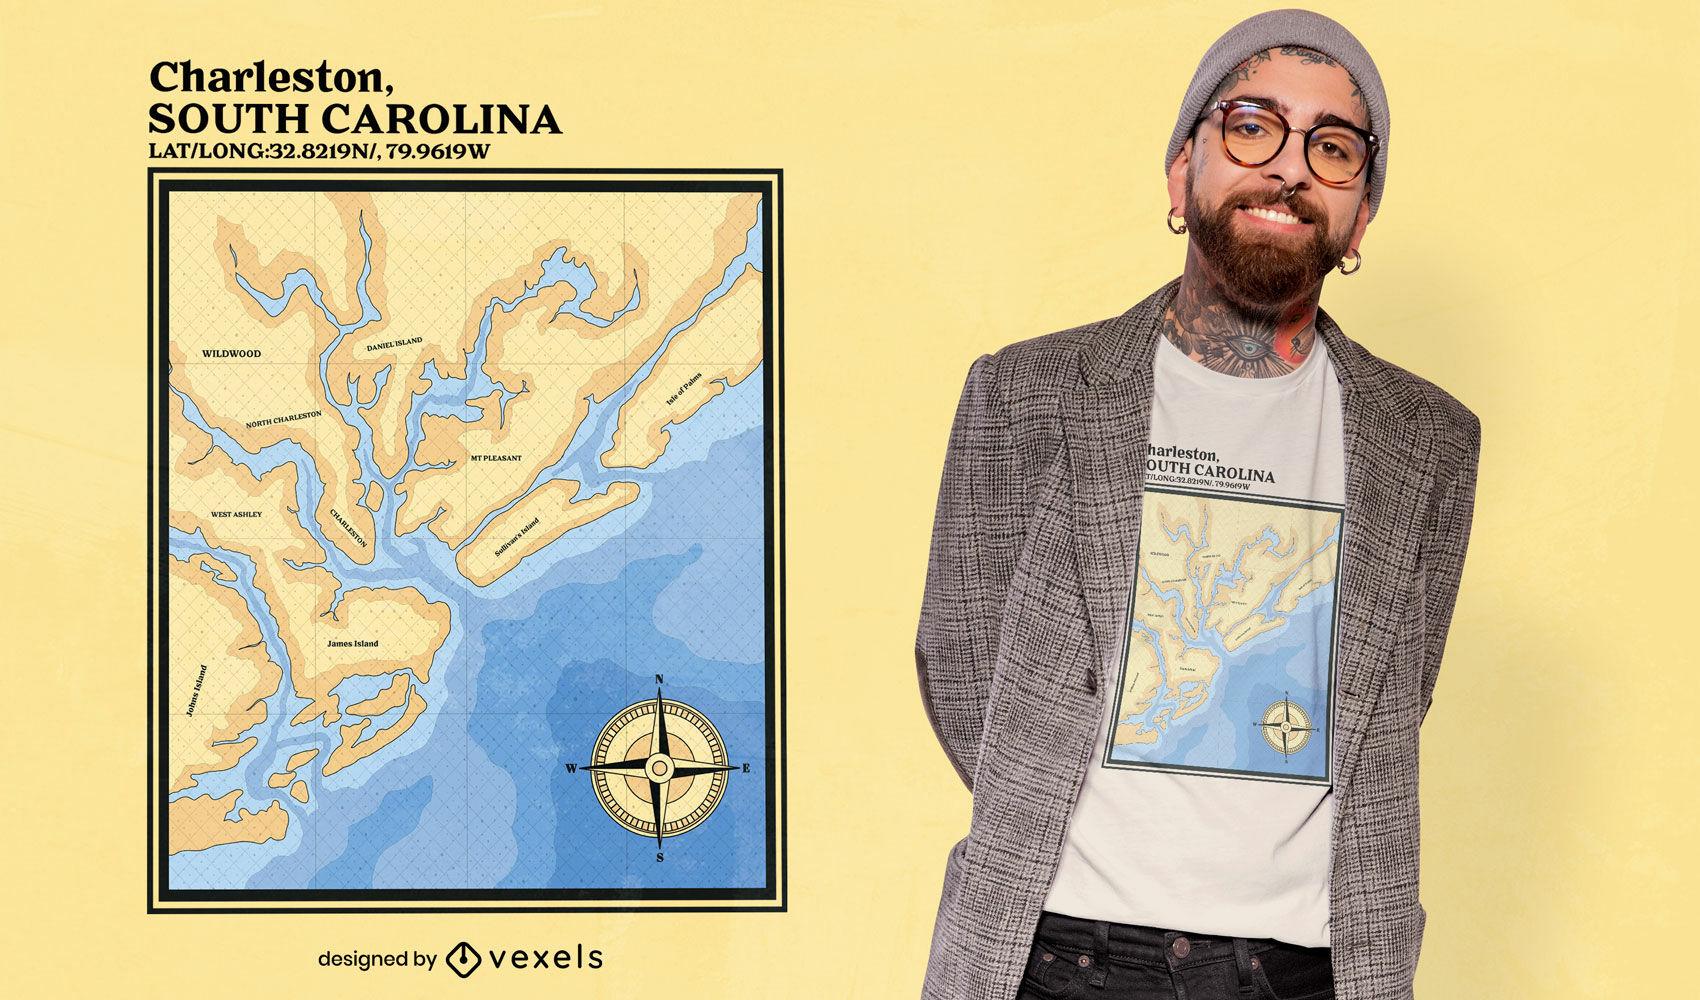 Charleston South Carolina nautic map t-shirt design